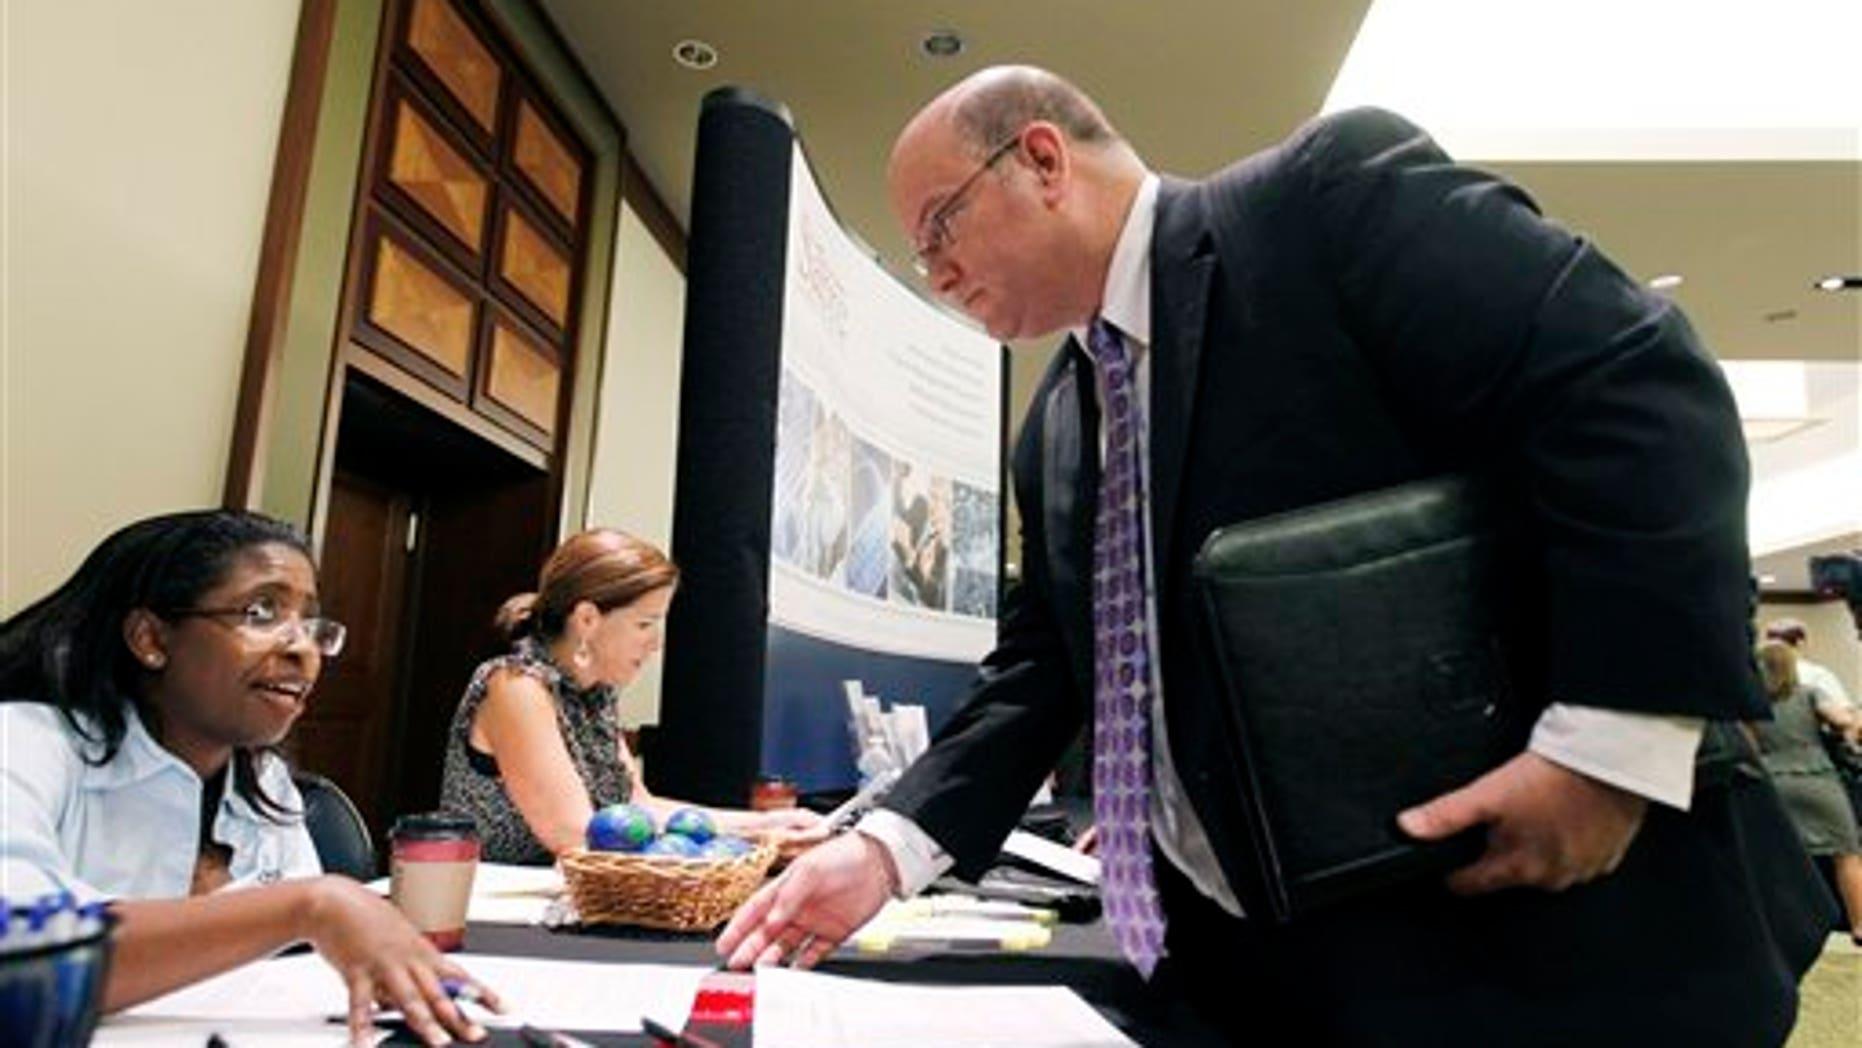 August 4: Job seeker during a Career Job Fair in Arlington, Va.